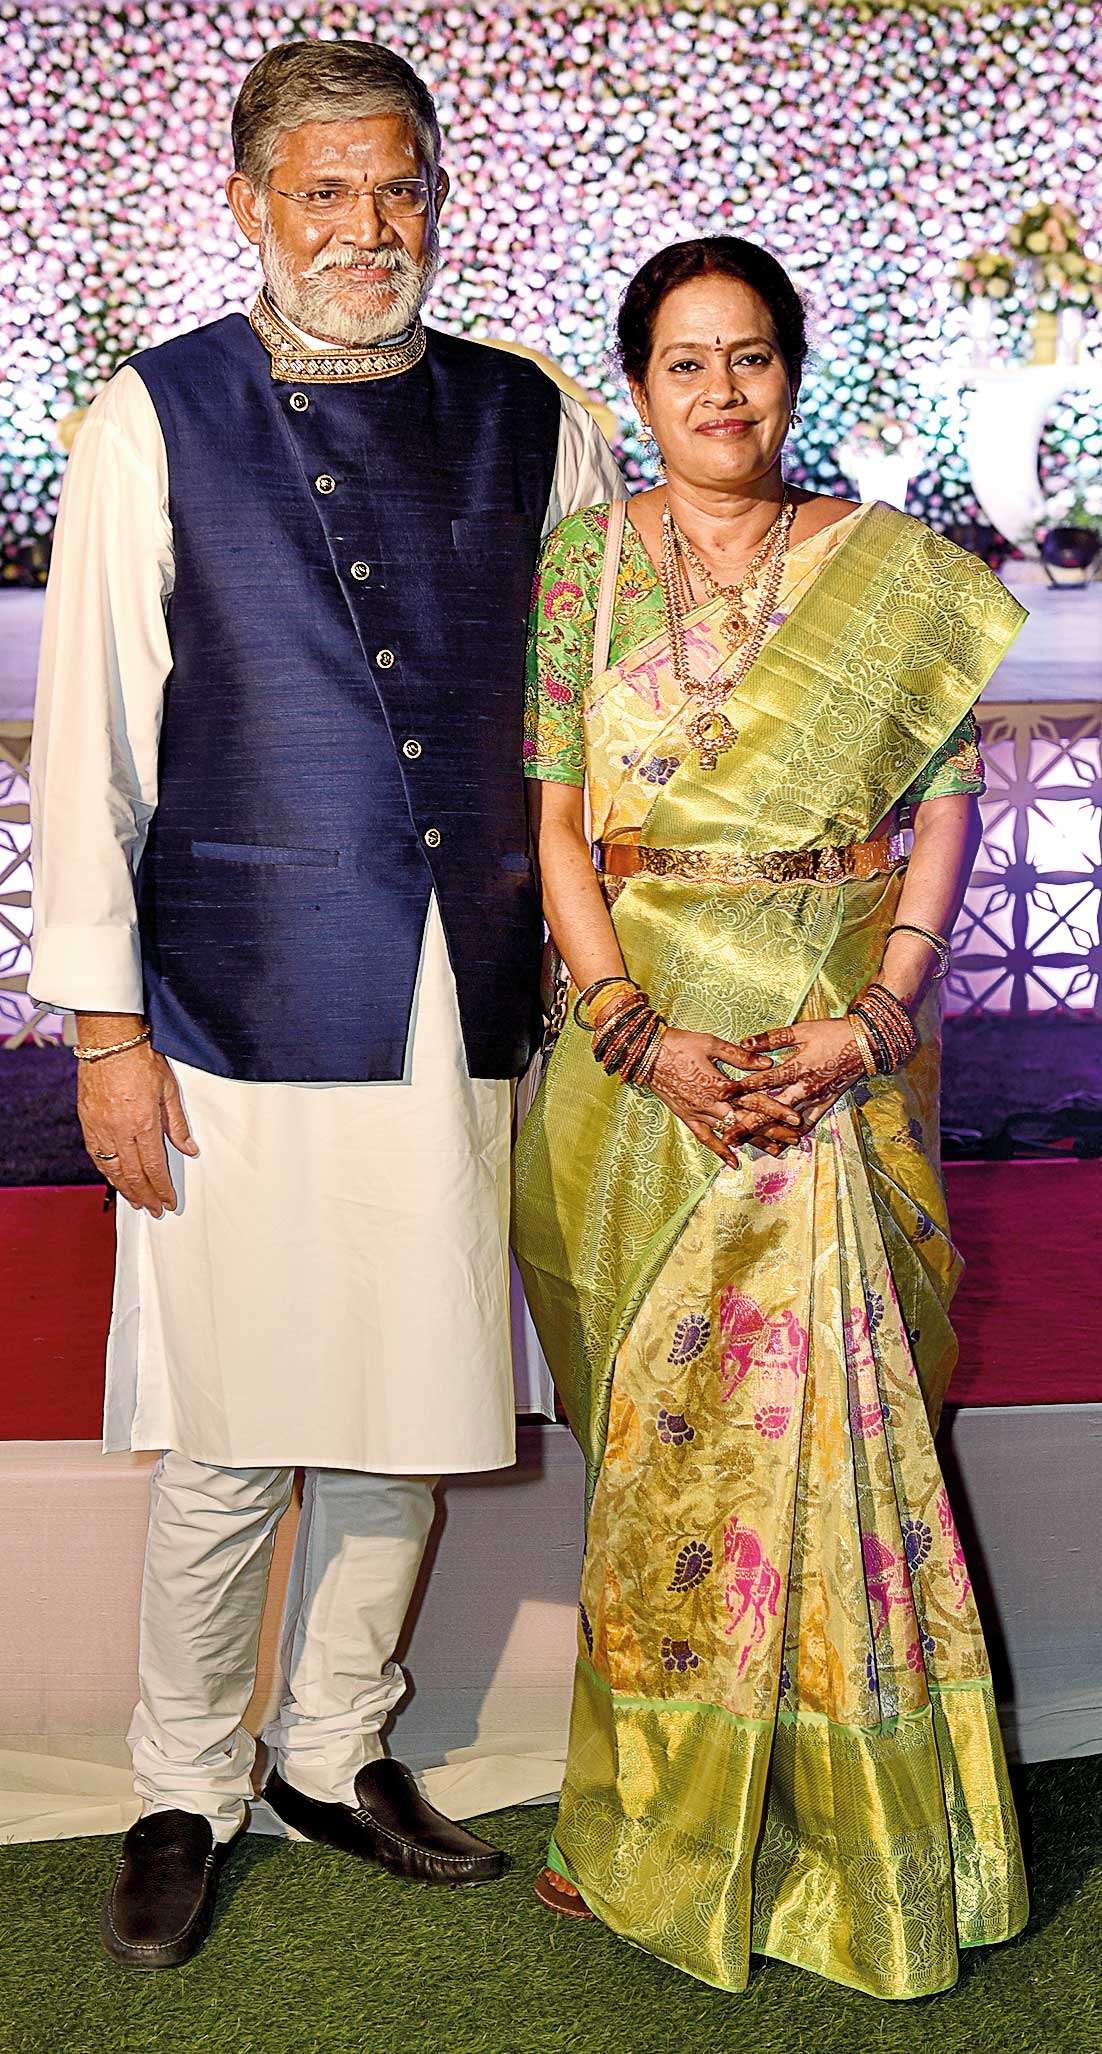 Teja and Divya's elegant wedding soirée | Hyderabad News - Times of